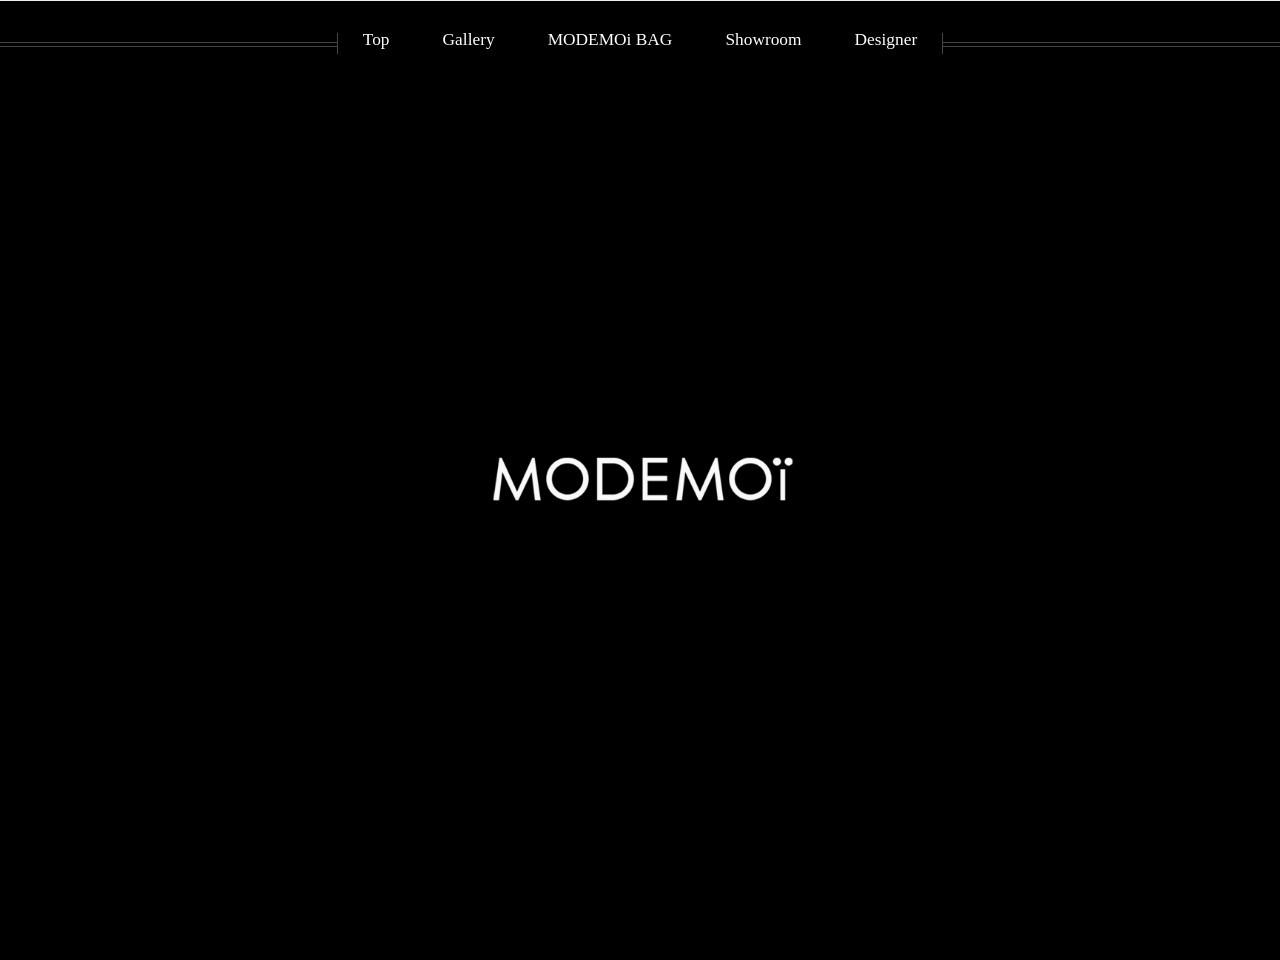 MODEMOi